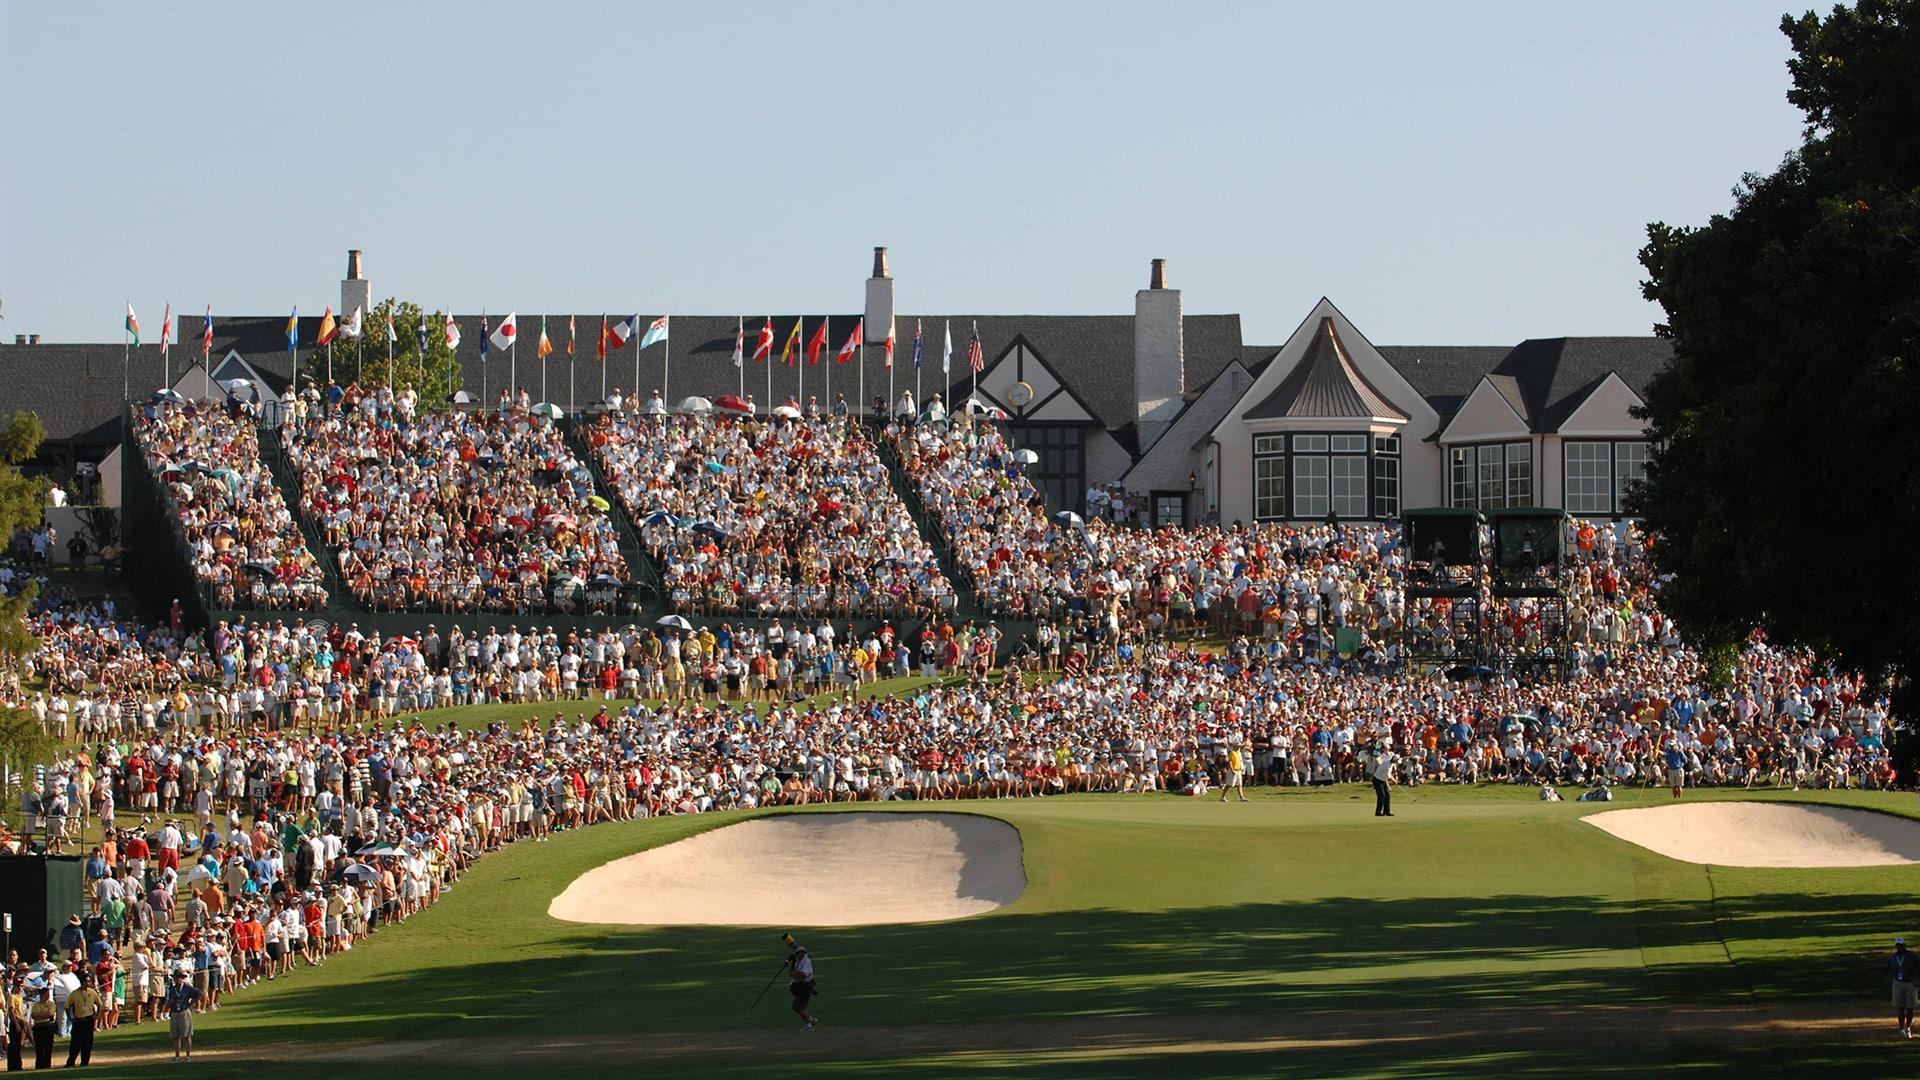 PGA awards 2022 PGA Championship to Southern Hills, replacing Trump Bedminster | Golf Channel